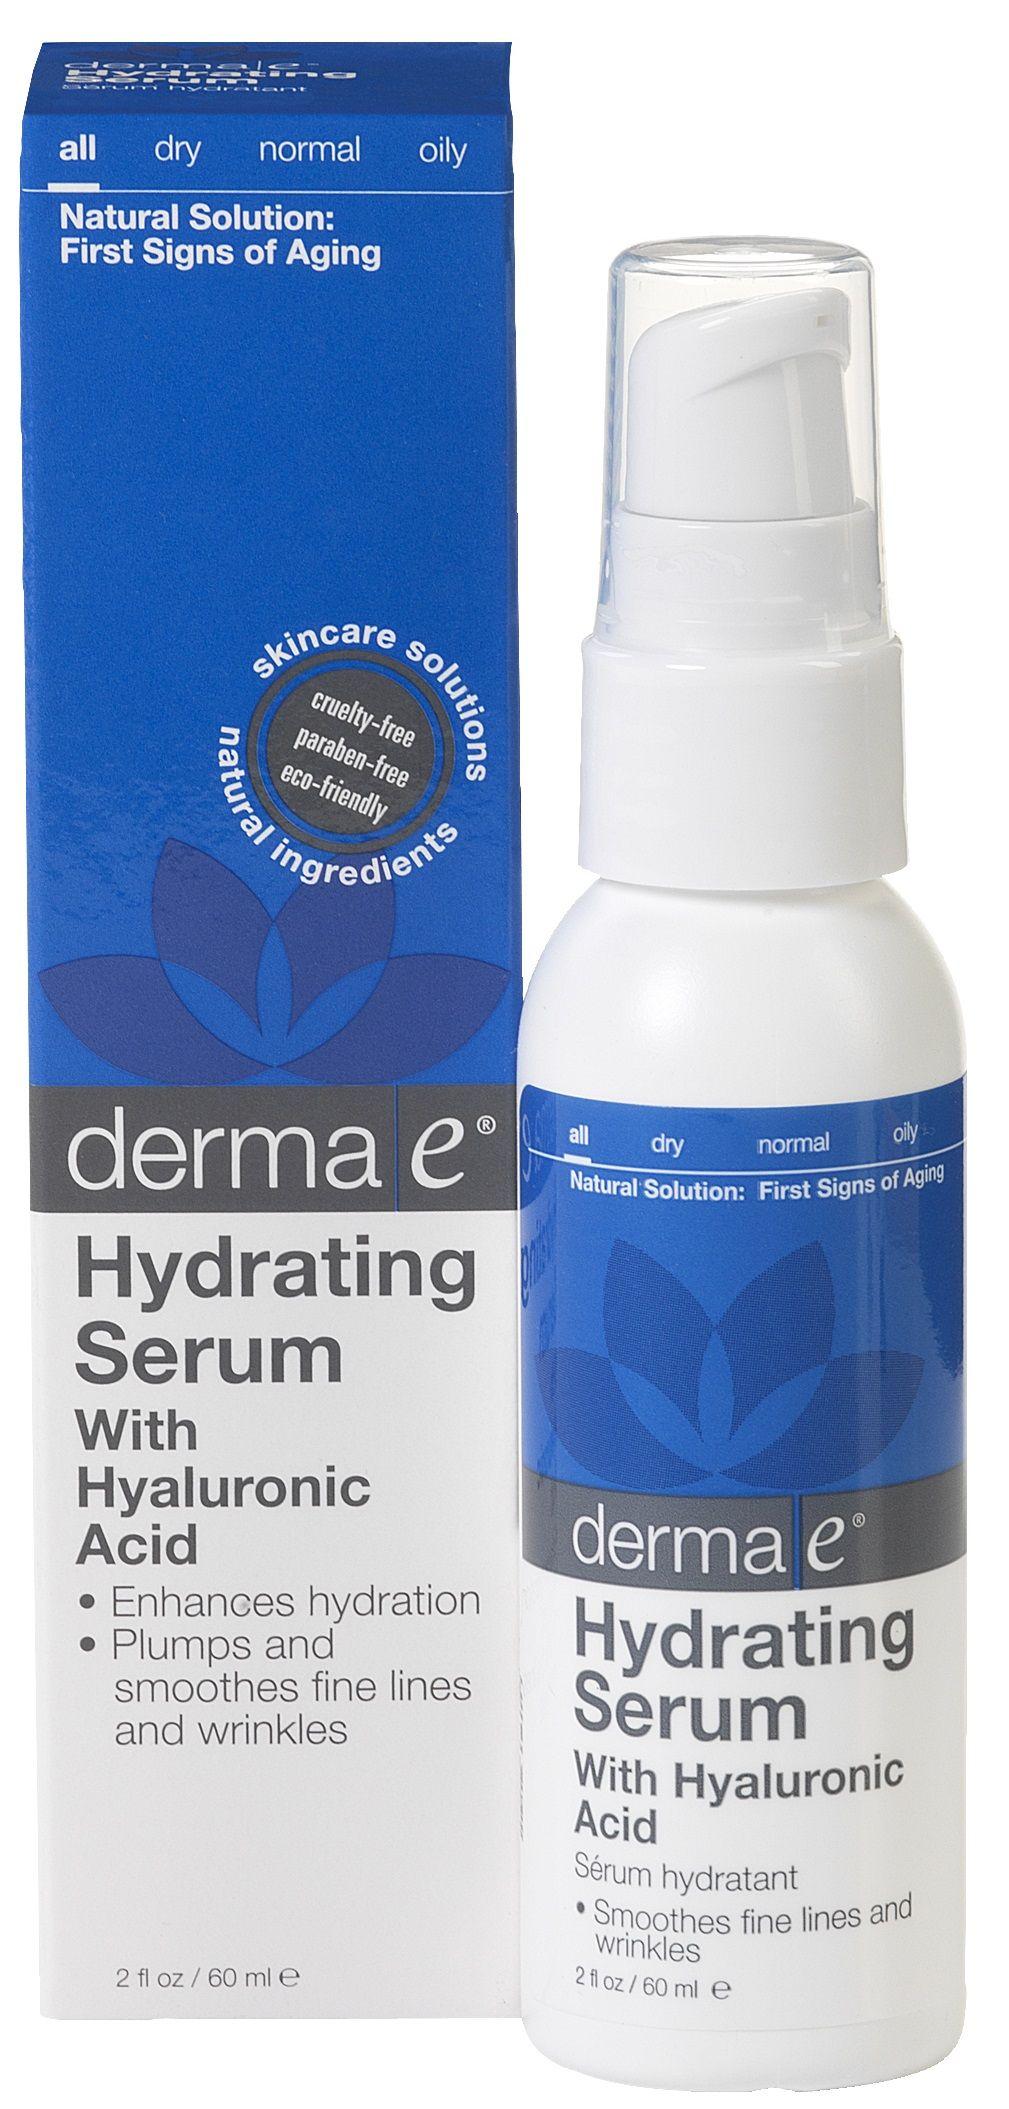 Derma E Hydrating Serum  Hydrating serum Hyaluronic acid and Serum